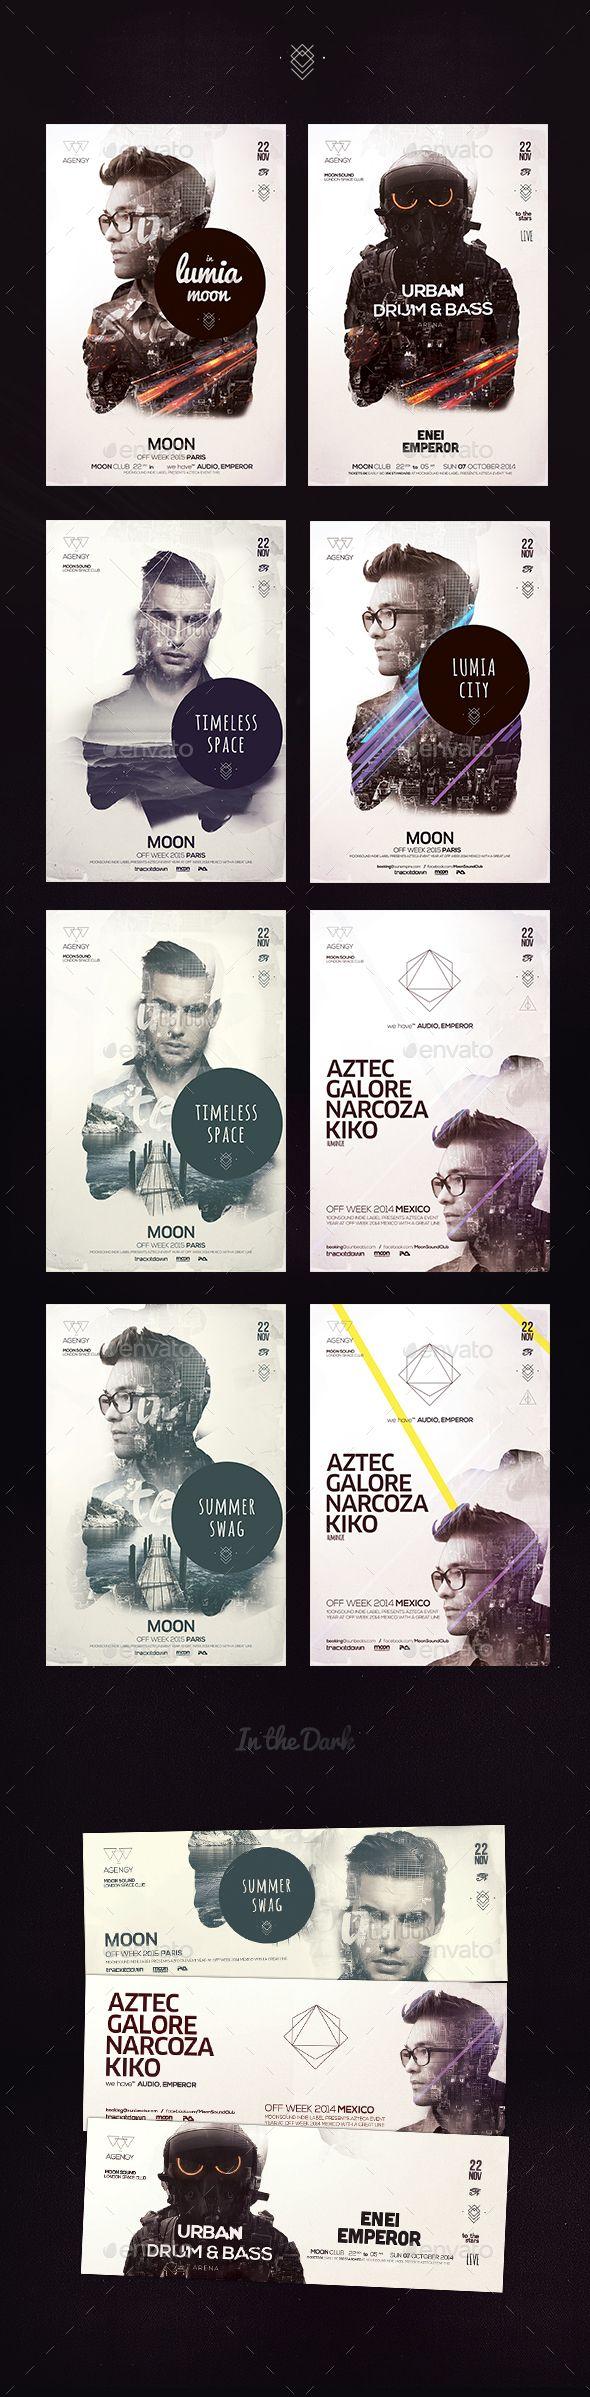 Double Exposure Bundle Posters Template PSD #design Download: http://graphicriver.net/item/double-exposure-bundle-posters/13198533?ref=ksioks